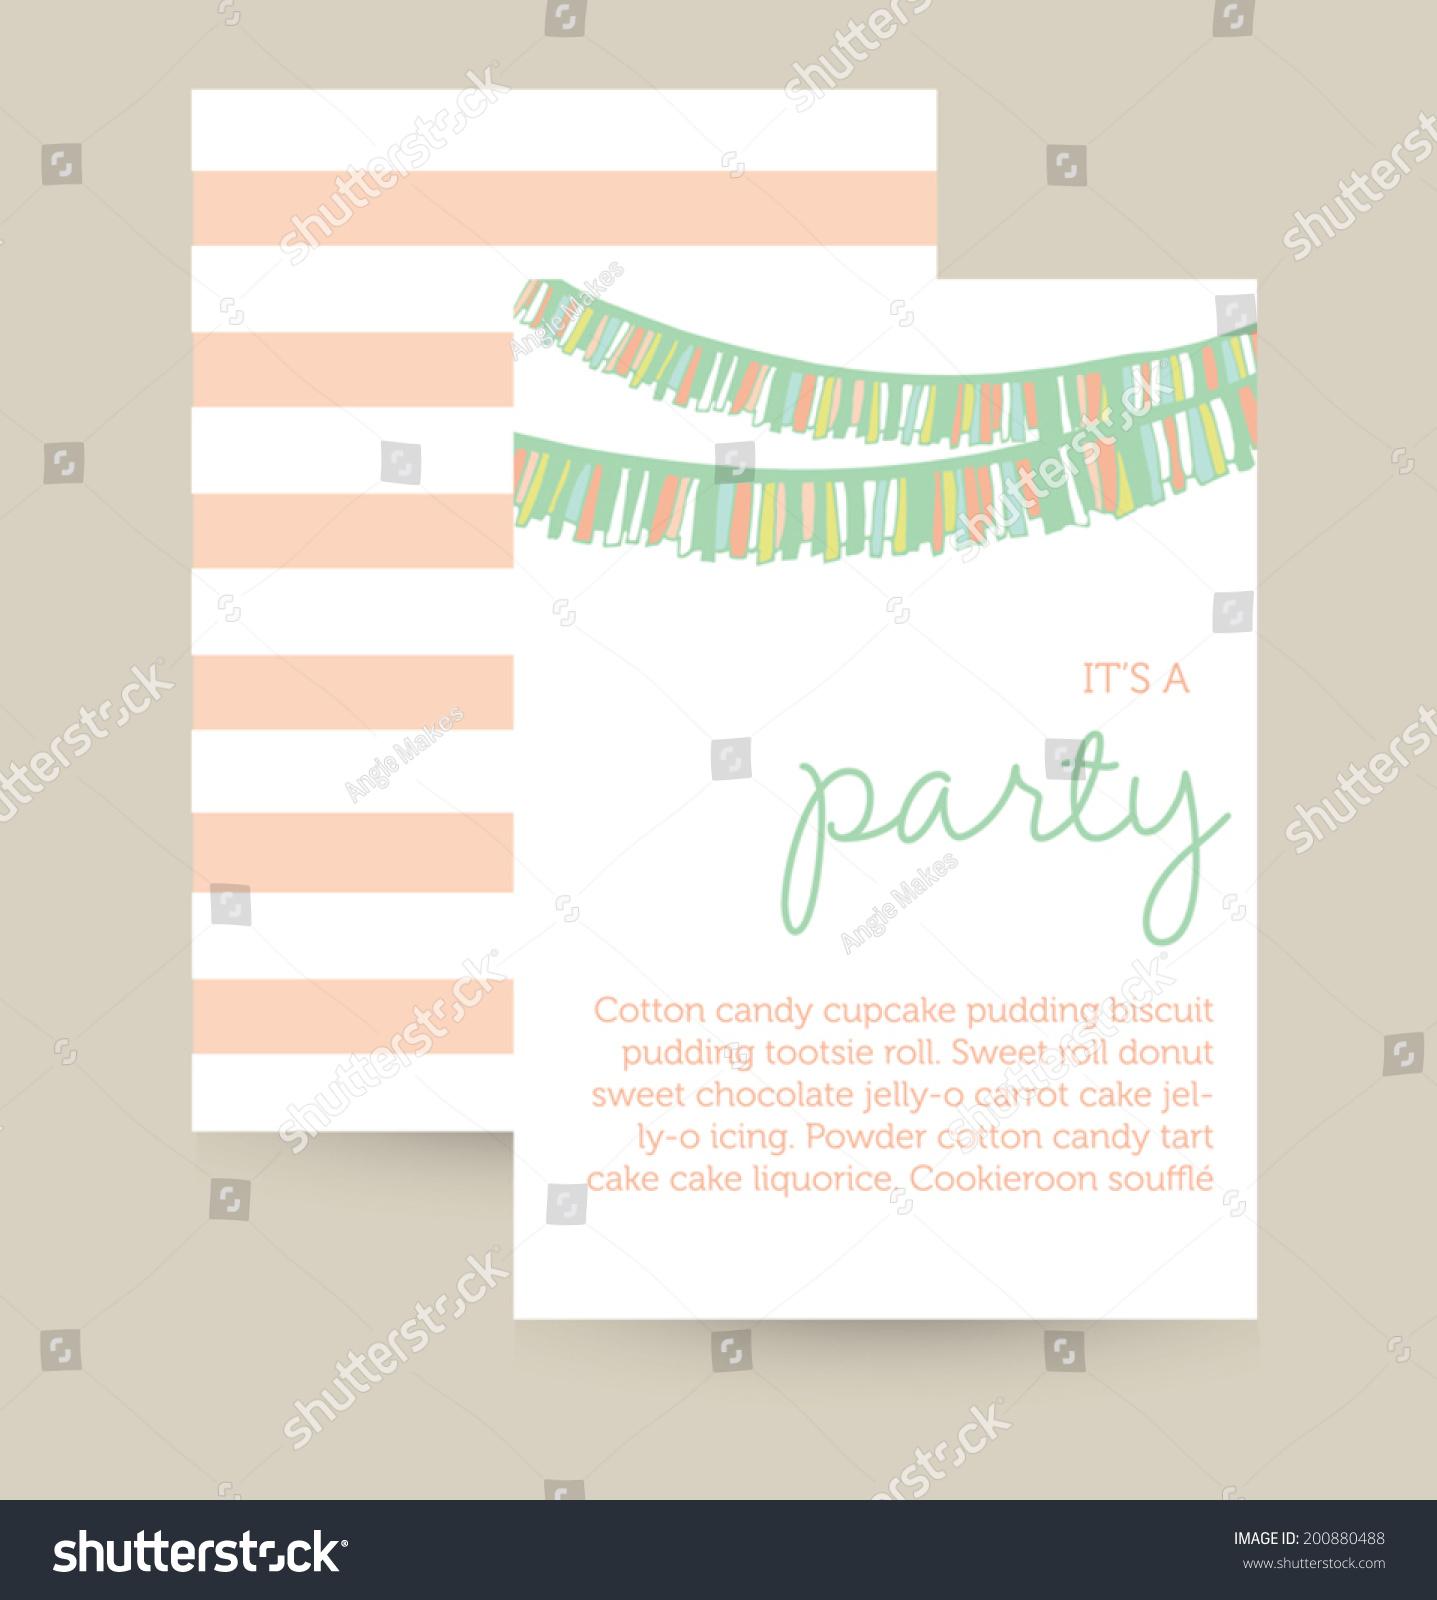 cute vector party invitation template birthday stock vector cute vector party invitation template birthday party invitation party garland